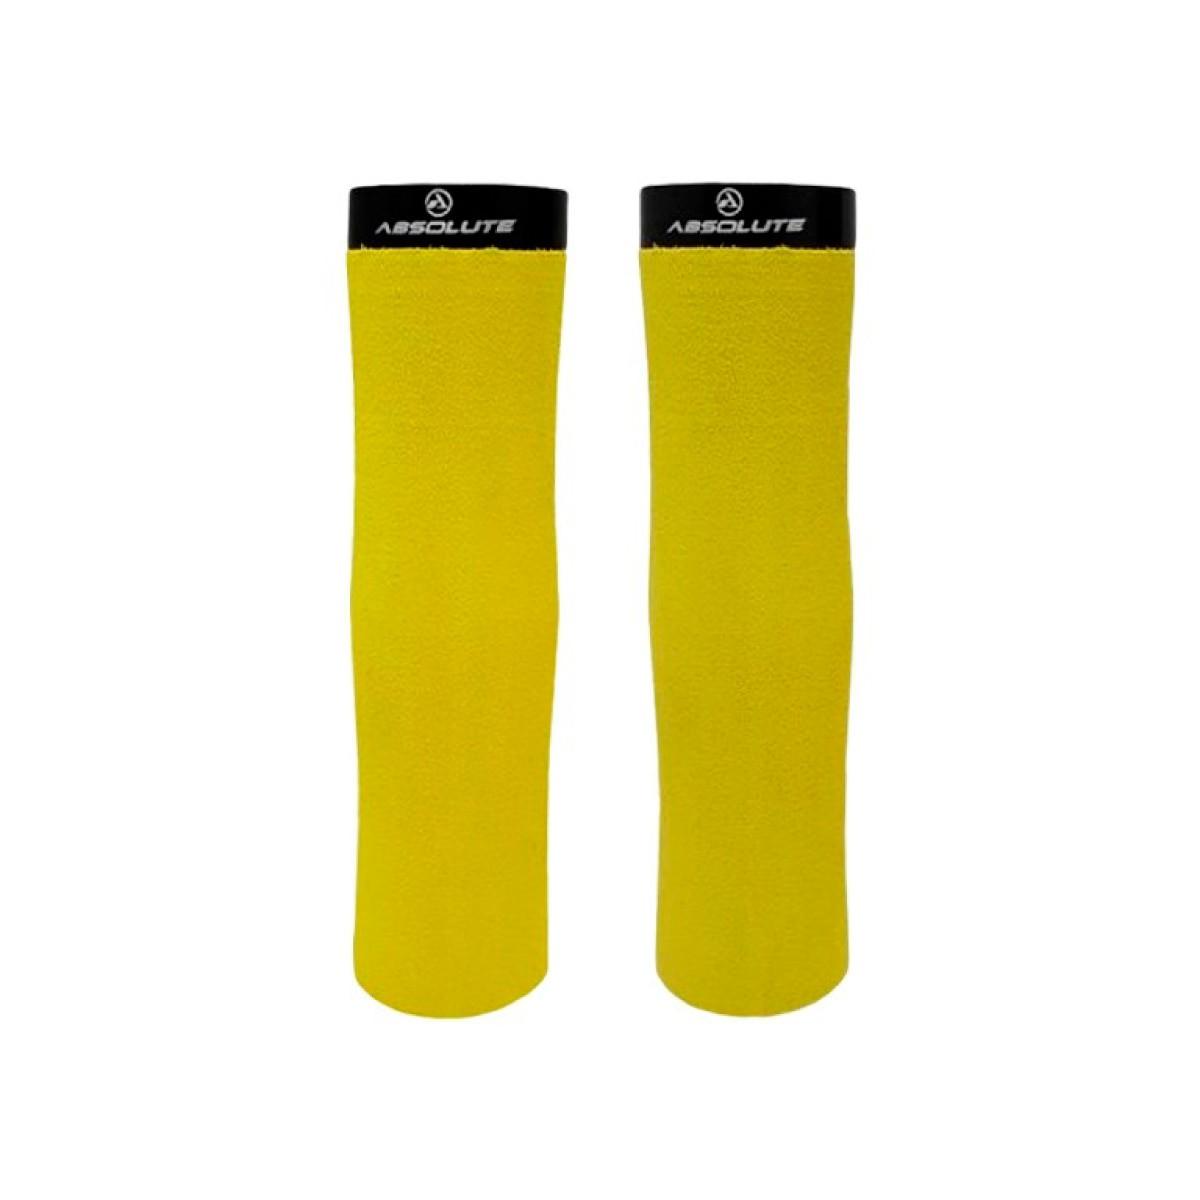 Manopla Absolute HL-G98 Amarelo